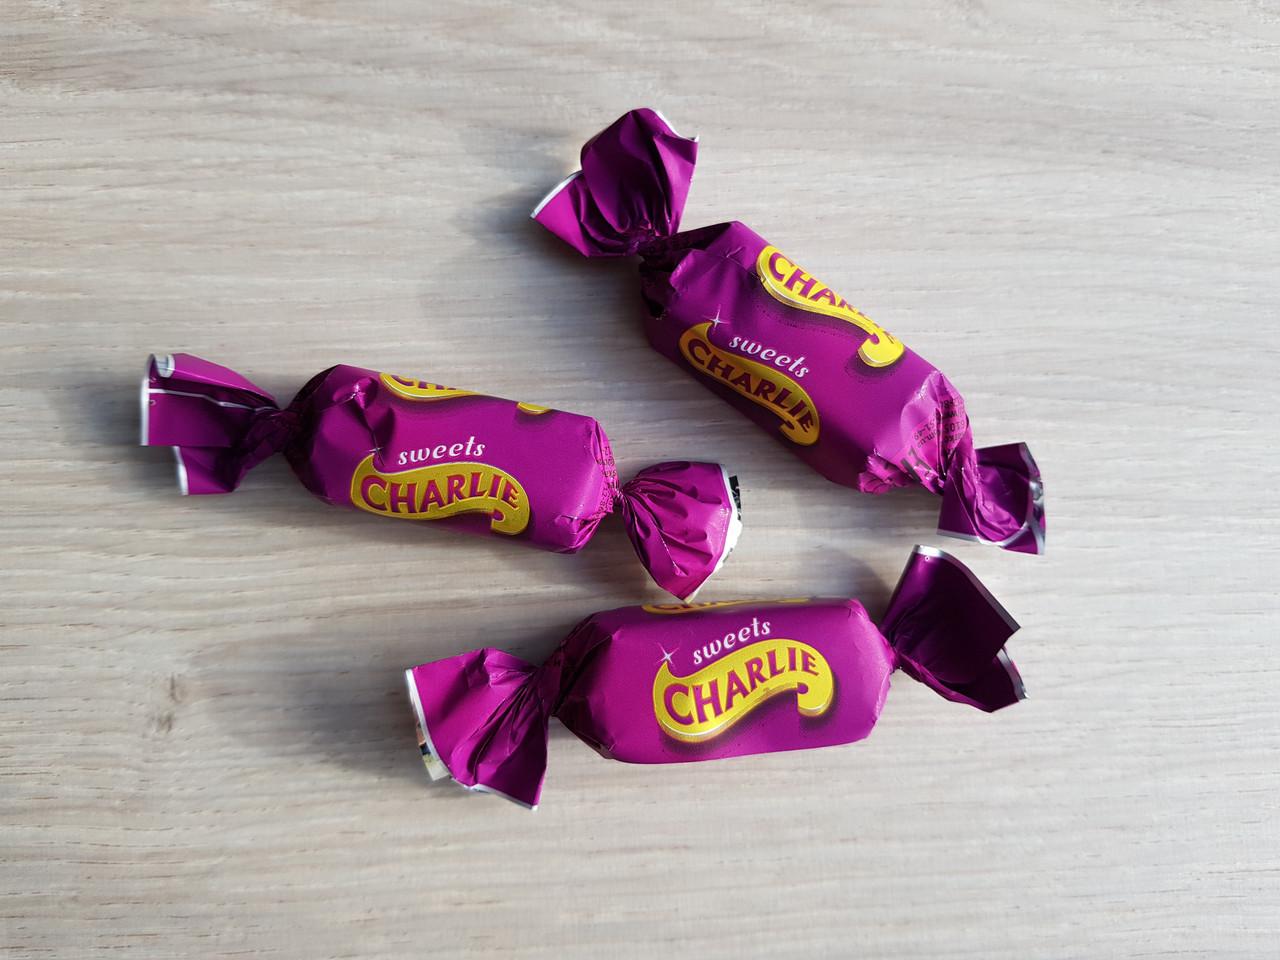 Конфеты CHARLIE 4 кг.  ТМ ХБФ